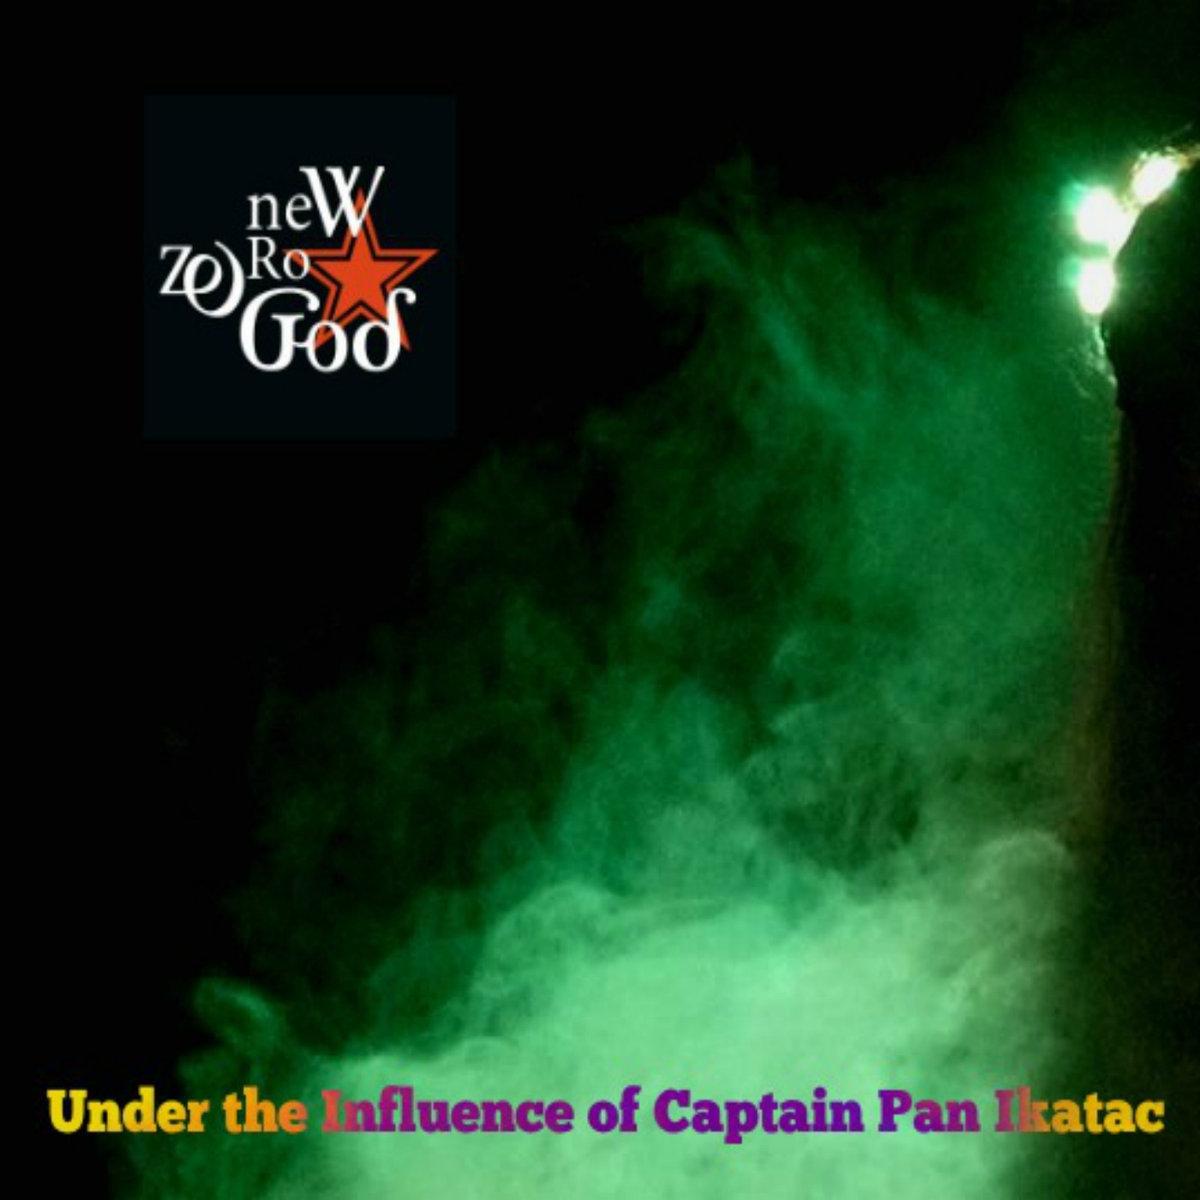 New Zero God 'Under the Influence of Captain Pan Ikatac'